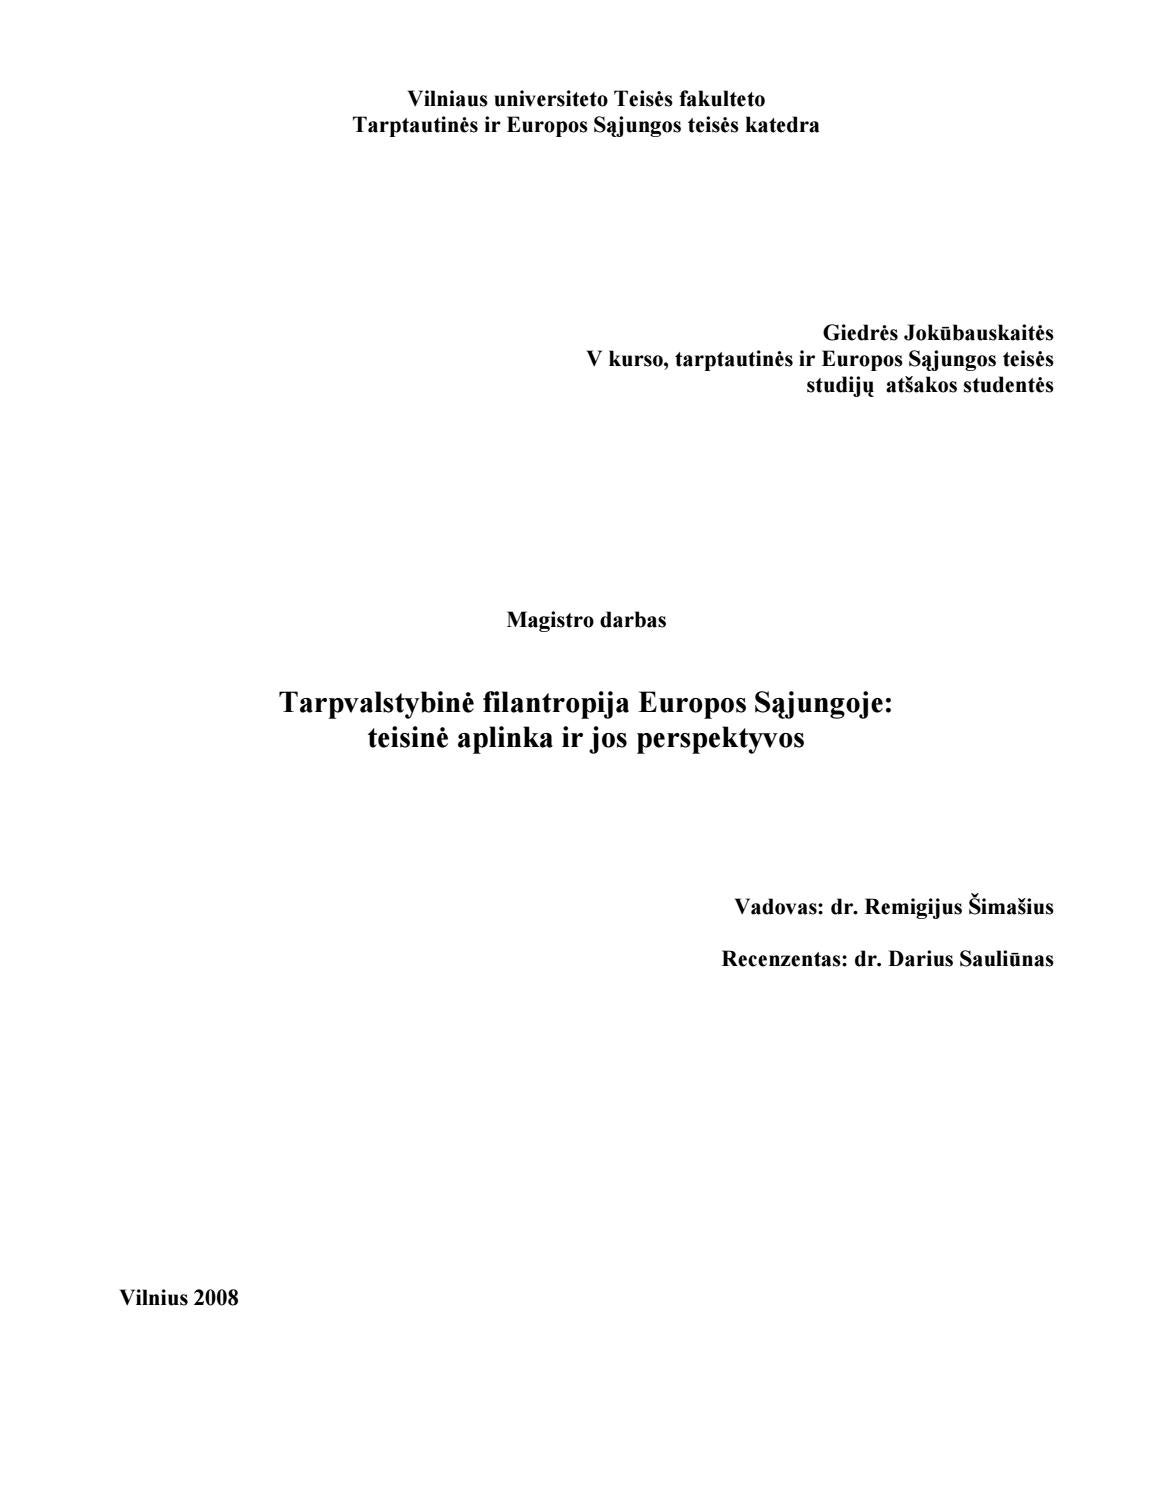 efc prekybos strategija)